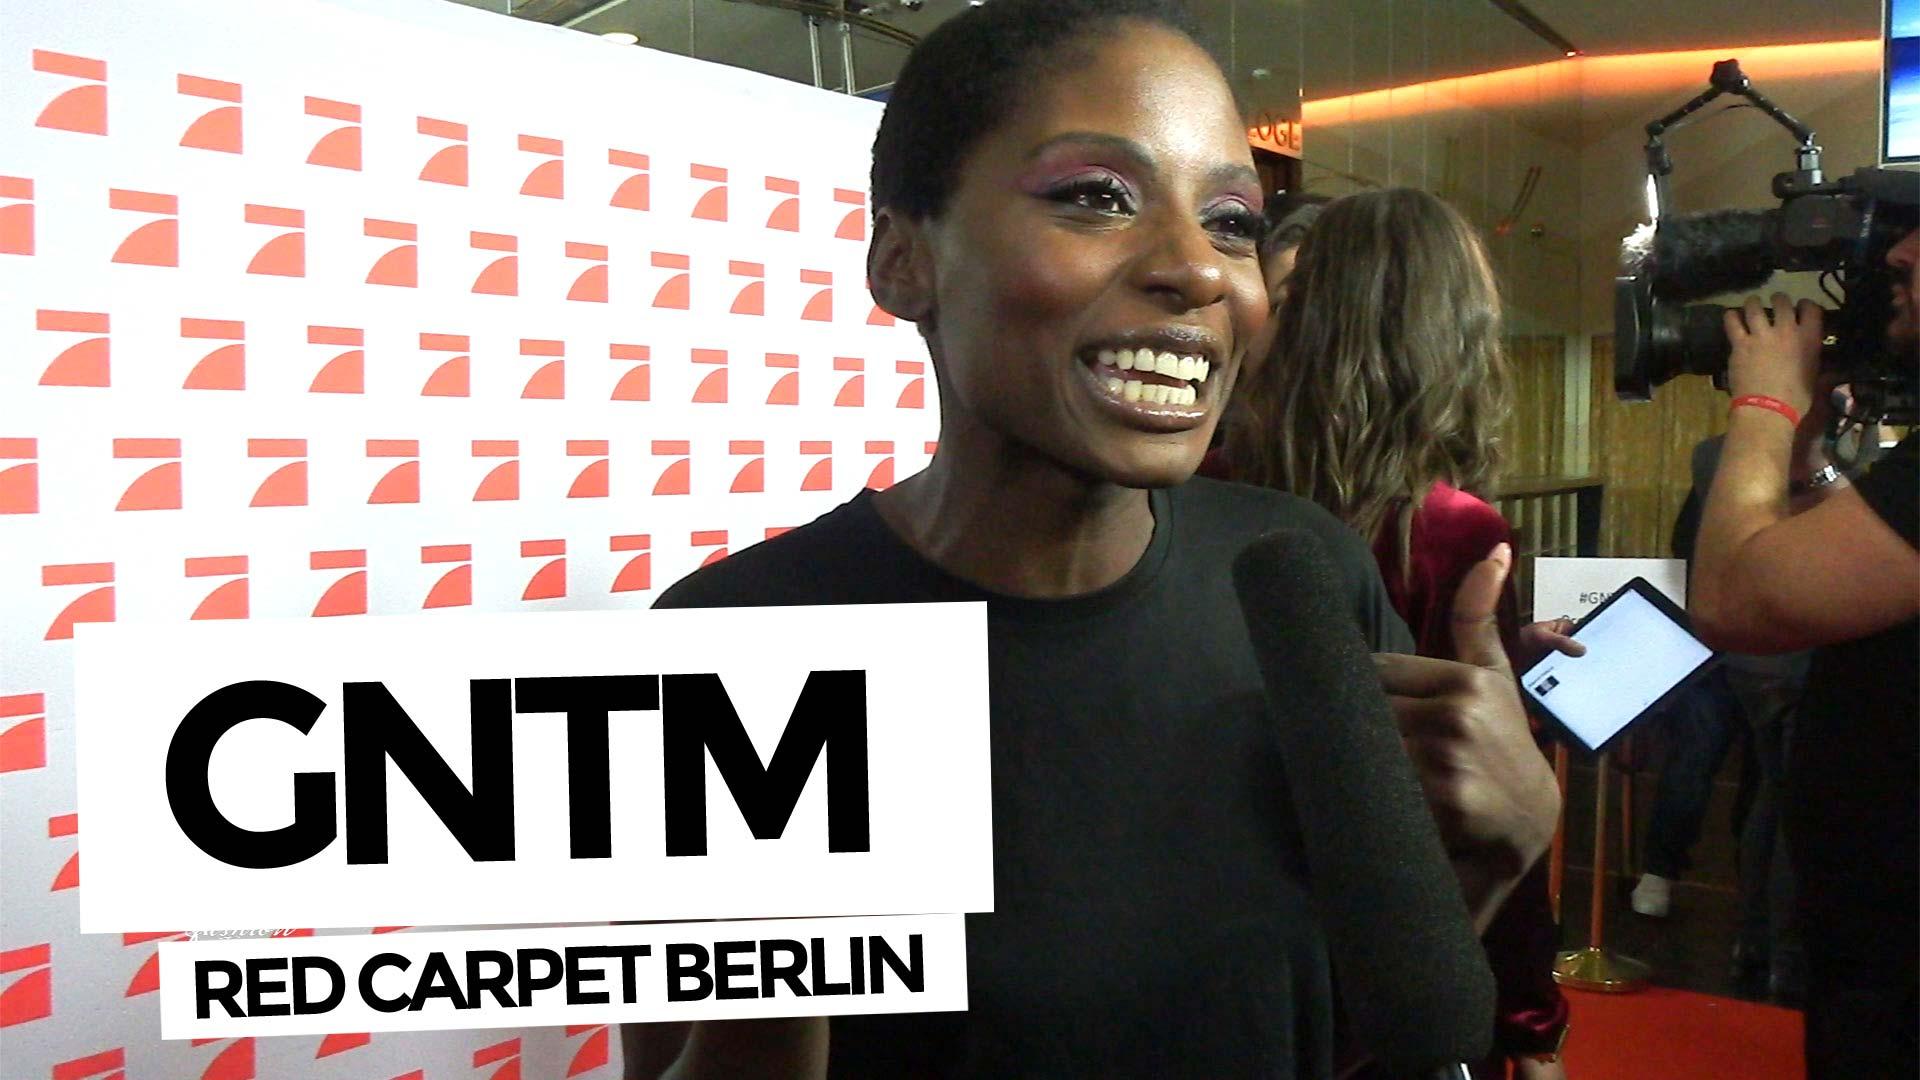 Germanys Next Topmodel 2018 - Das erwartet euch in der 1. GNTM Folge! Preview x Berlin